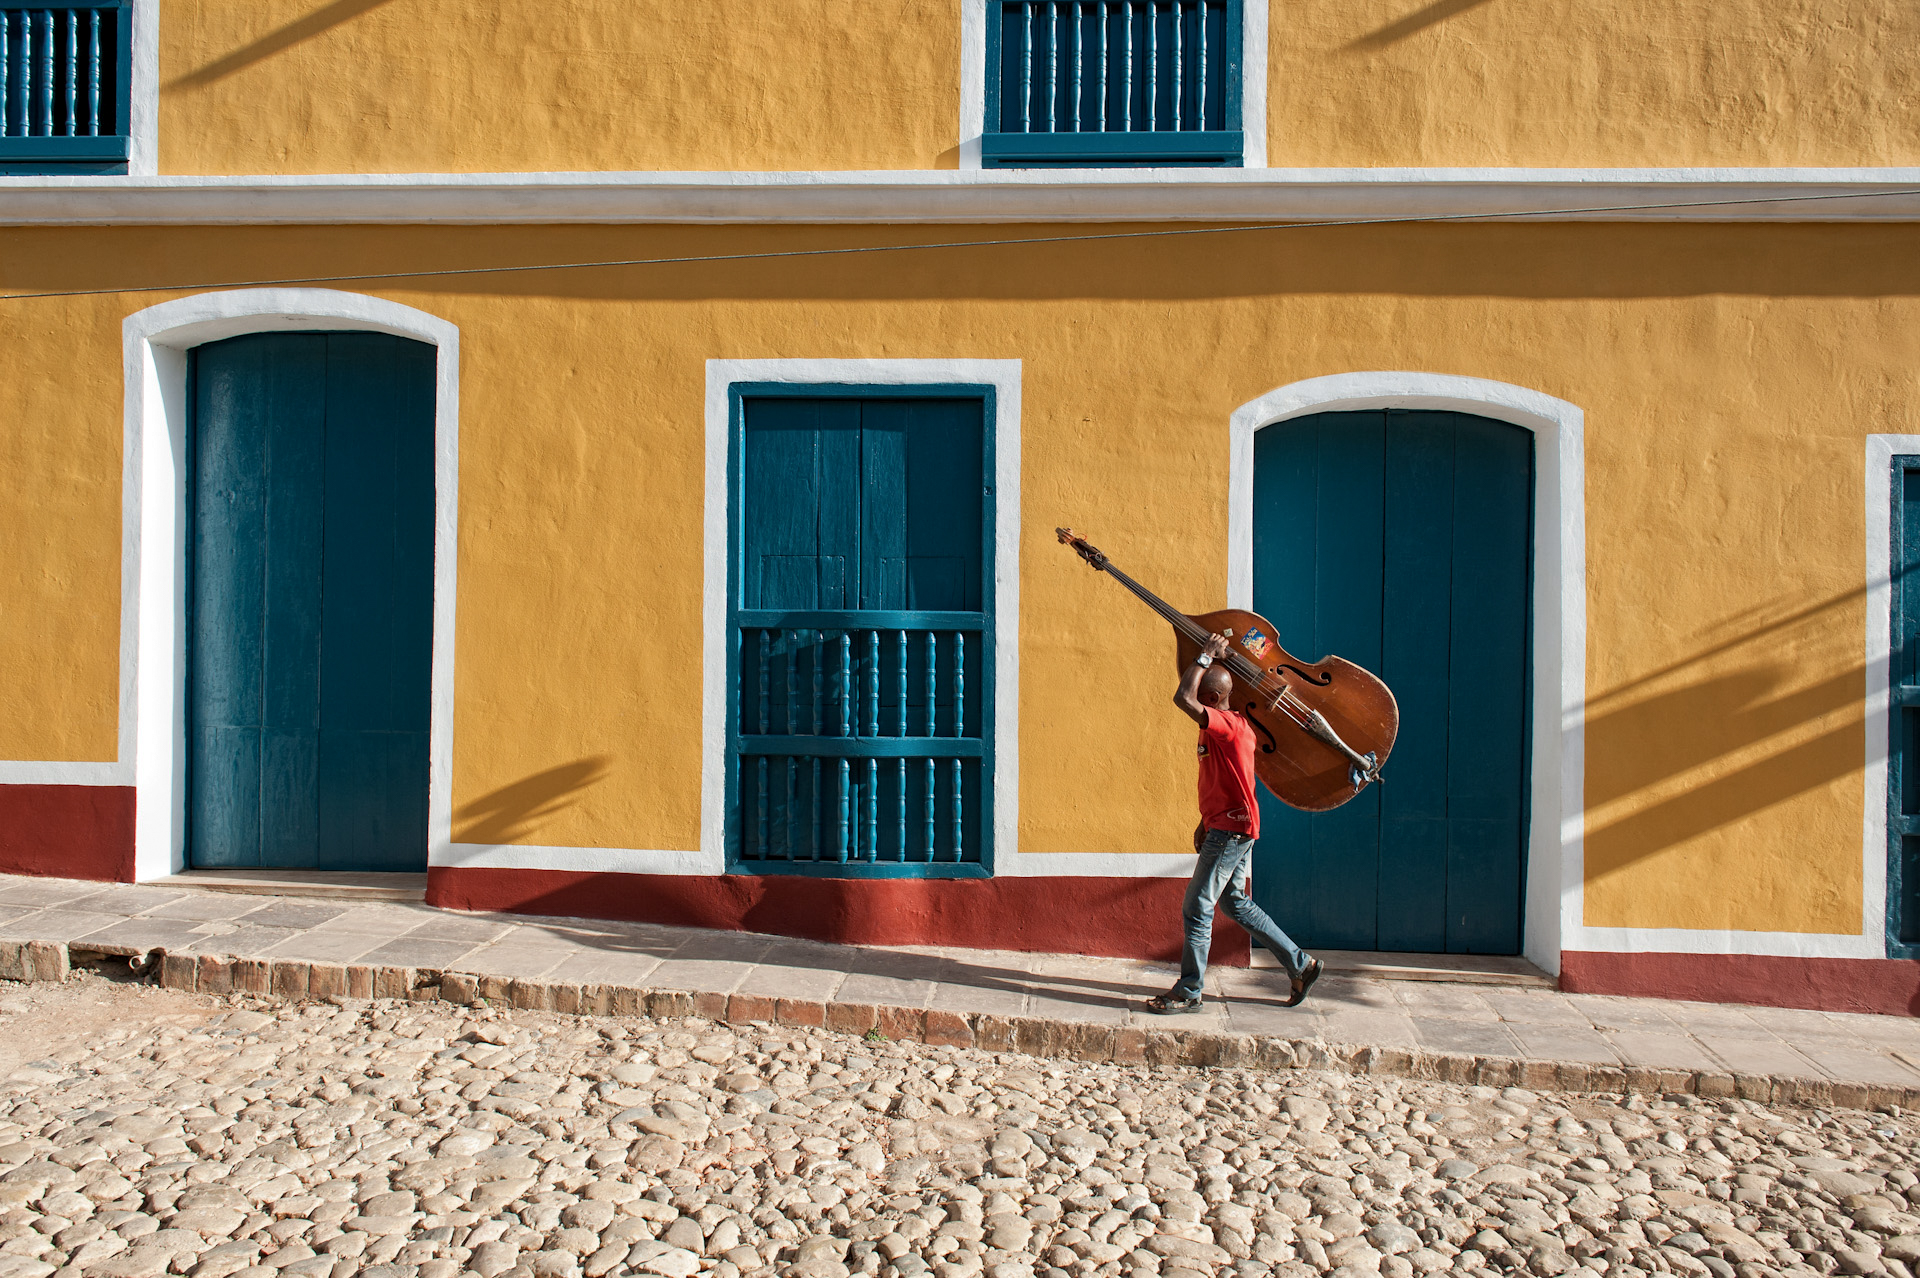 Jason_Bax_Travel_Cuba-Trinidad-Travel-Street.JPG